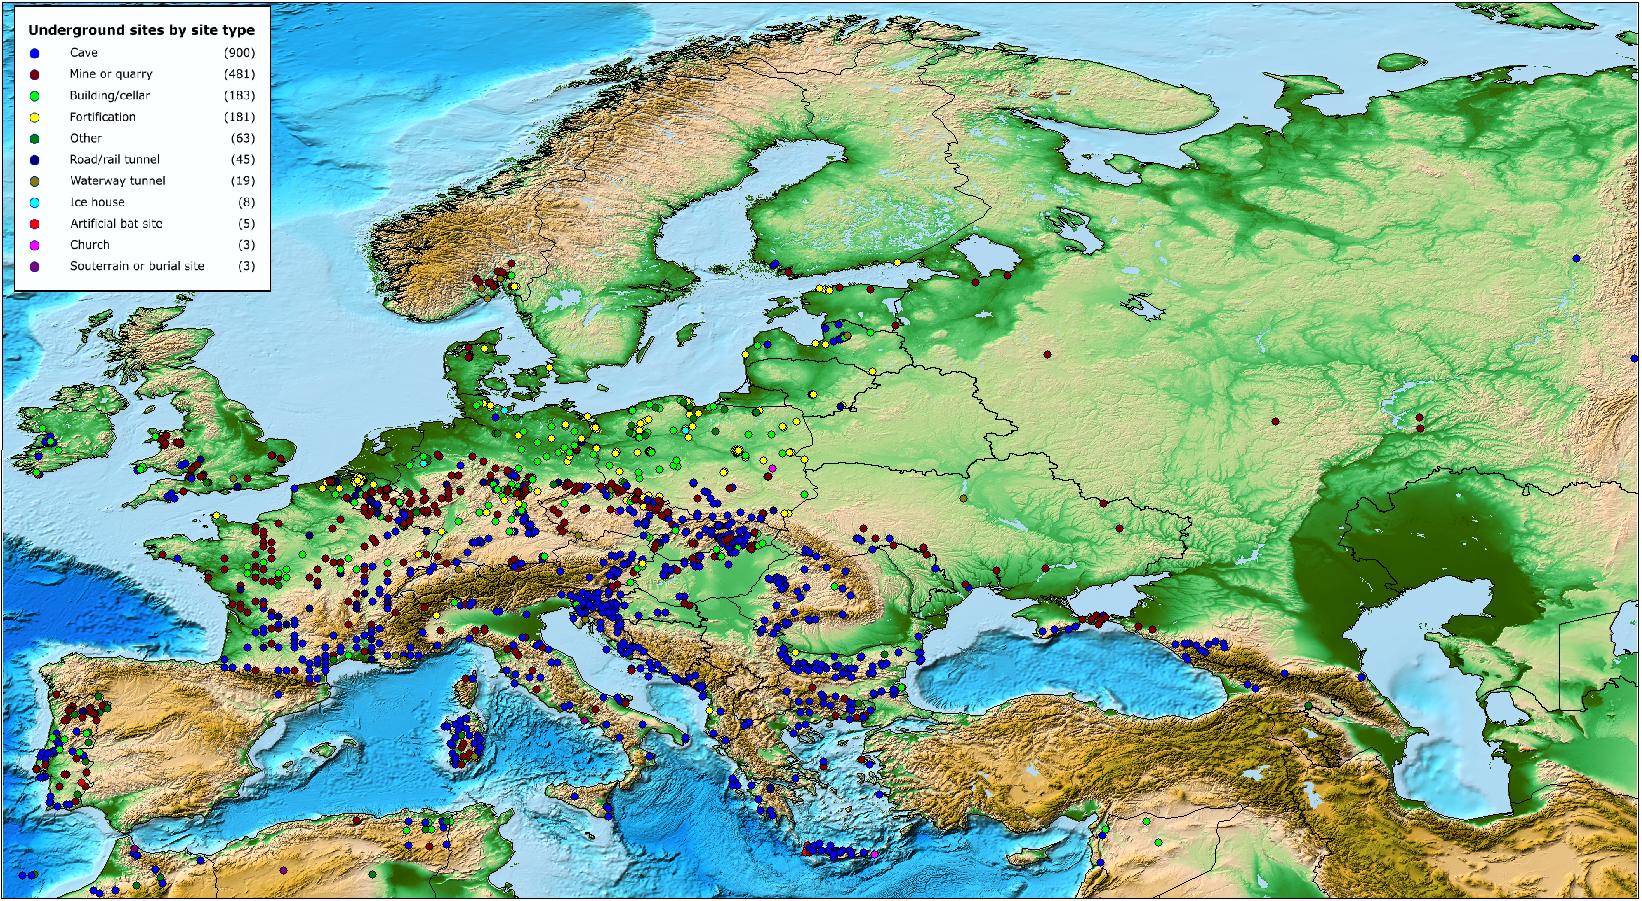 Conservation of Key Underground sites: the database | UNEP/EUROBATS